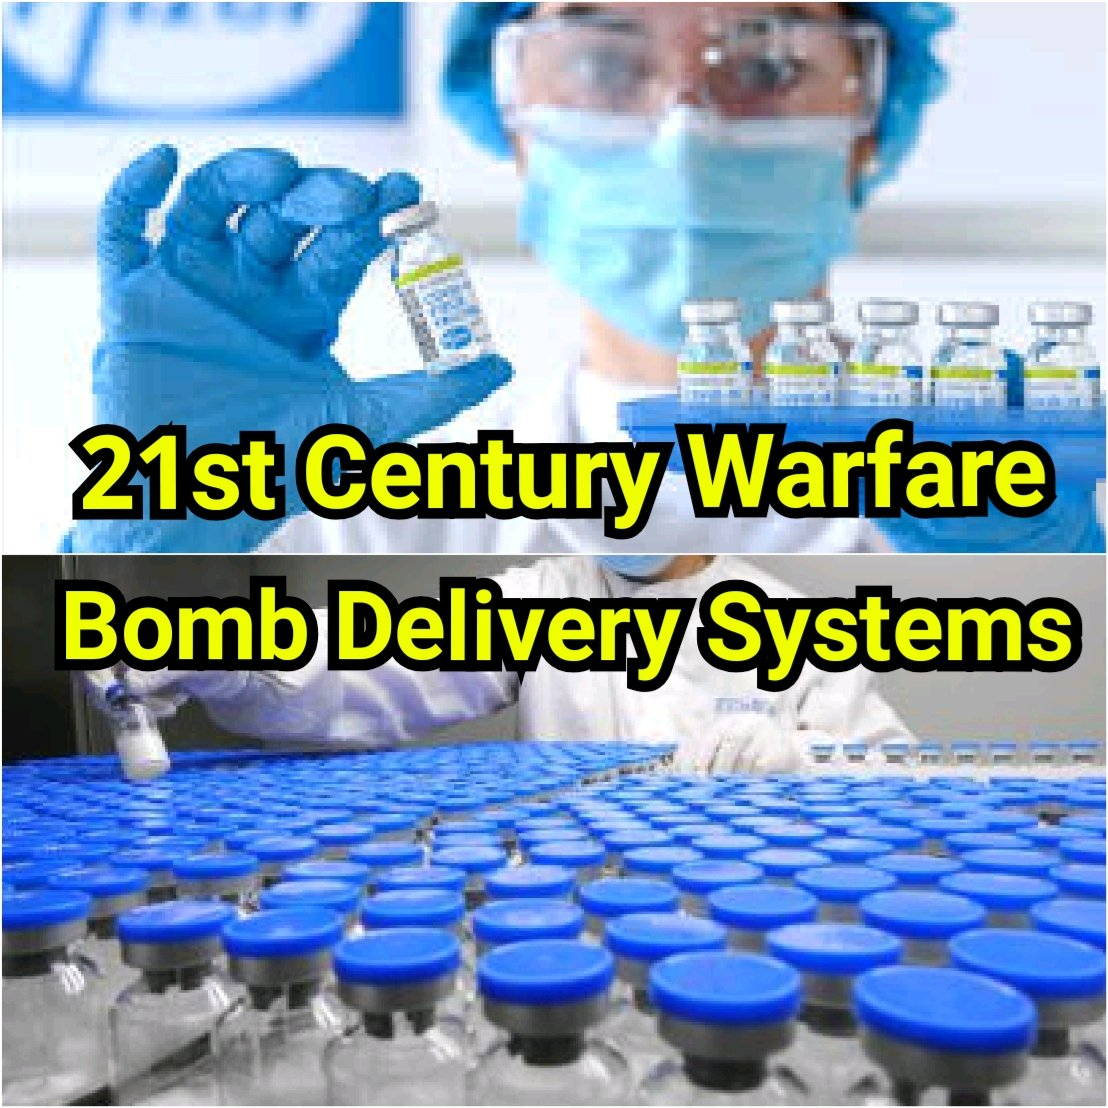 #COVID19 #coronavirus #Hoax #redpill #BillGates #BillGatesOfHell #WW3 #endtimes #tribulation #FakePandemic #BillGatesOfHell #Apocalypse